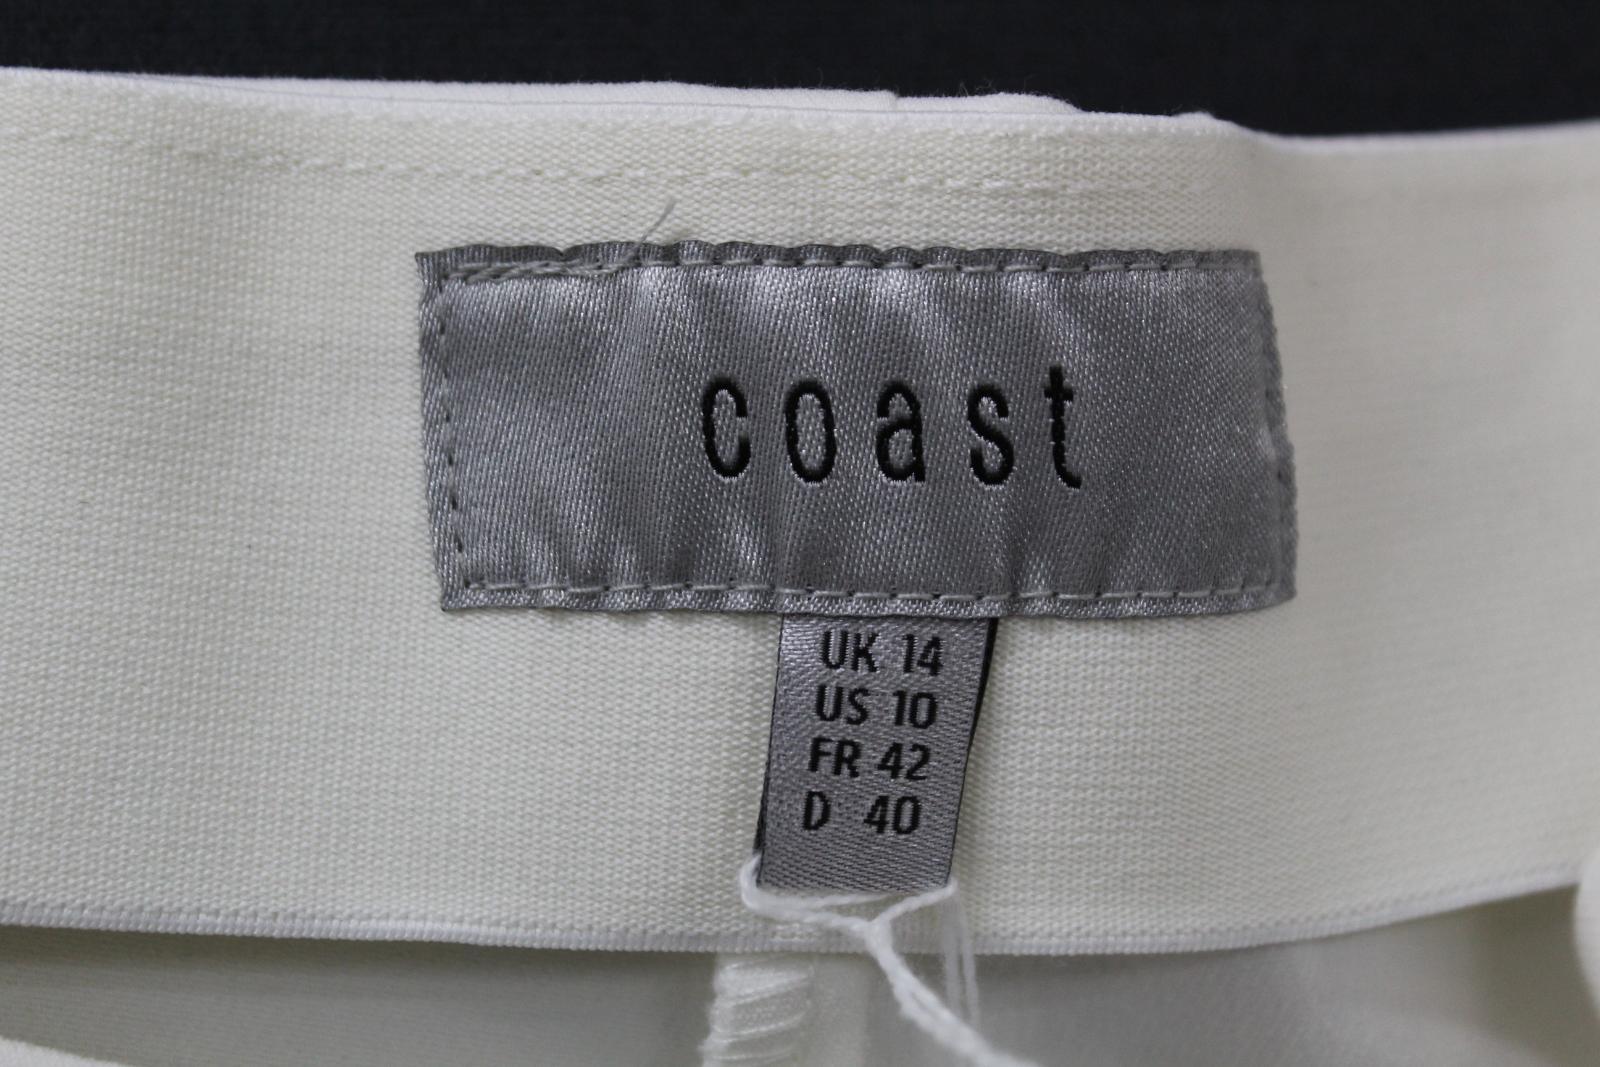 Costa-Damas-Marfil-Alexa-Algodon-Mezcla-recortada-High-rise-Pantalones-Cremallera-Lateral-UK14 miniatura 7